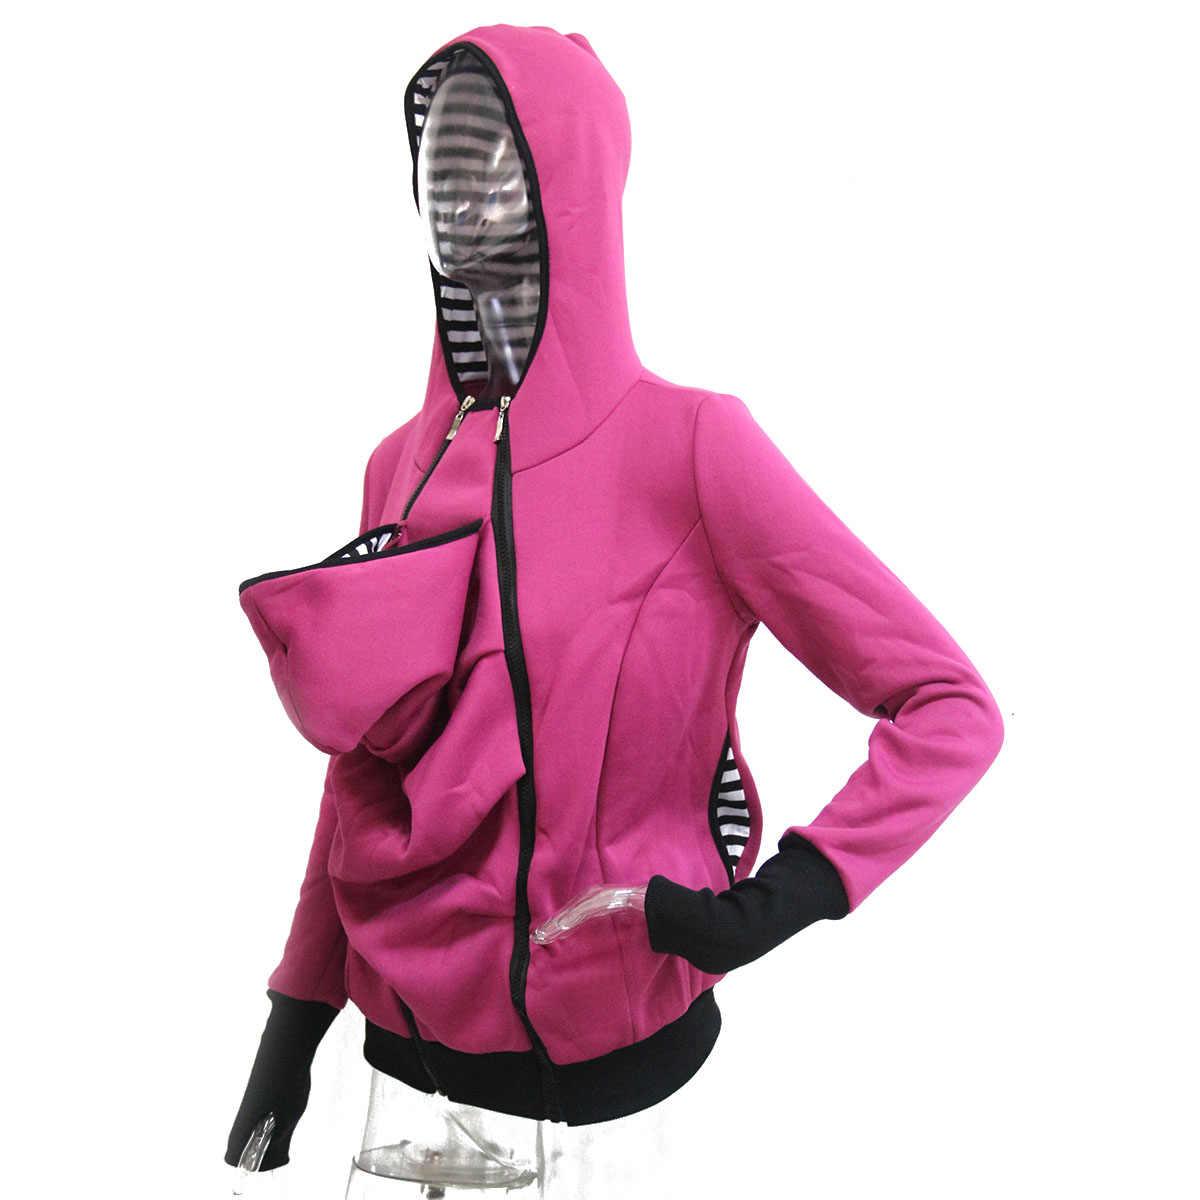 Meternity Hoodies Kangaroo ฤดูหนาว Hooded Coat สำหรับหญิงตั้งครรภ์ทารก Carrier Jacket Outerwear Coat เสื้อผ้าคลอดบุตร Thicken